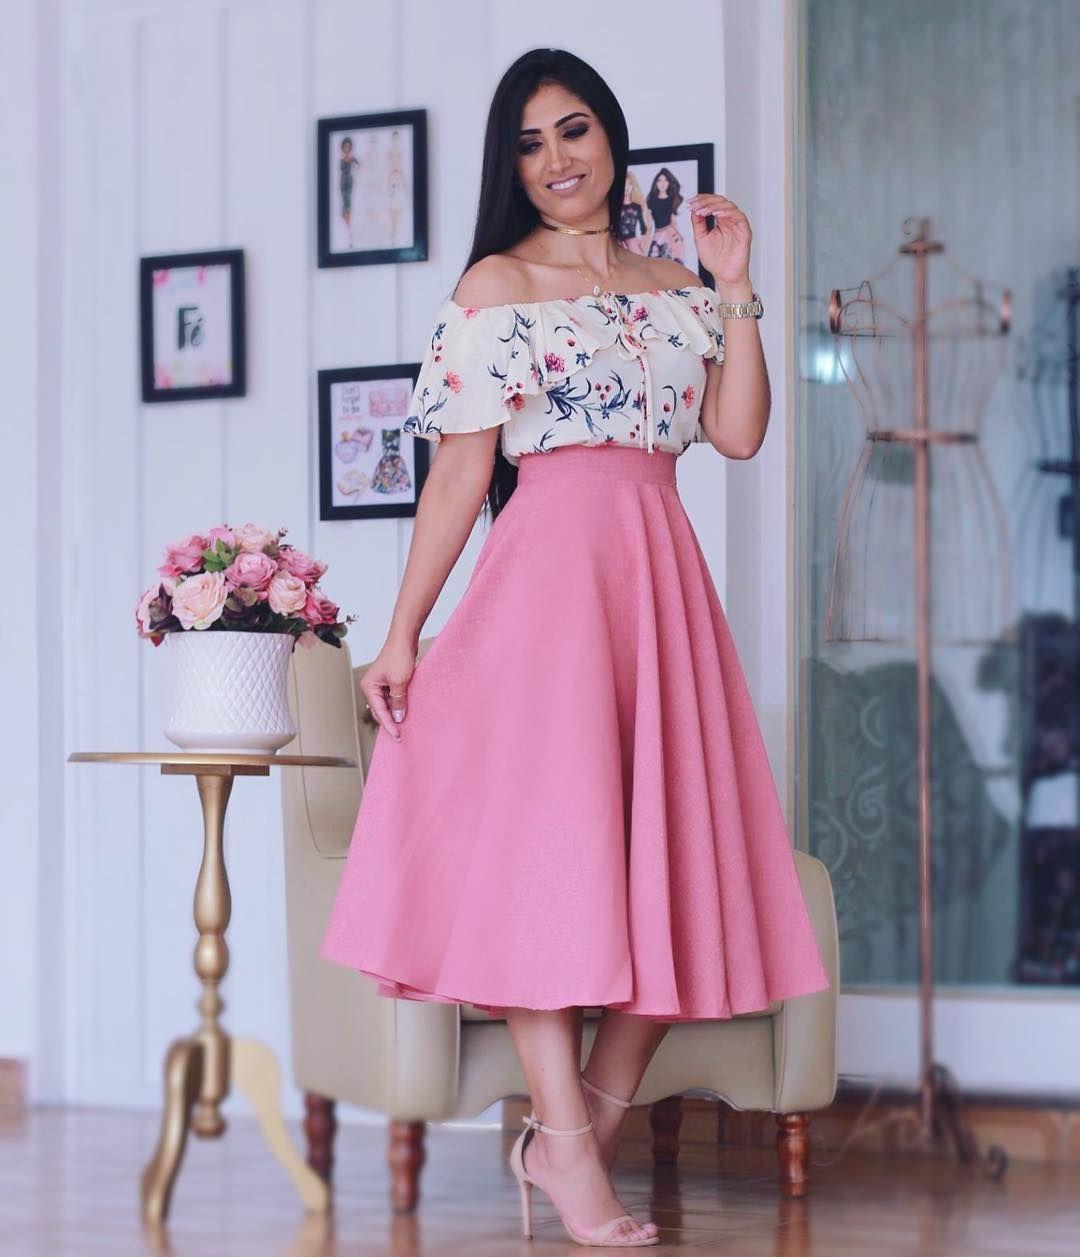 Pin by Solange Batista on saias | Pinterest | Jw fashion, Clothes ...